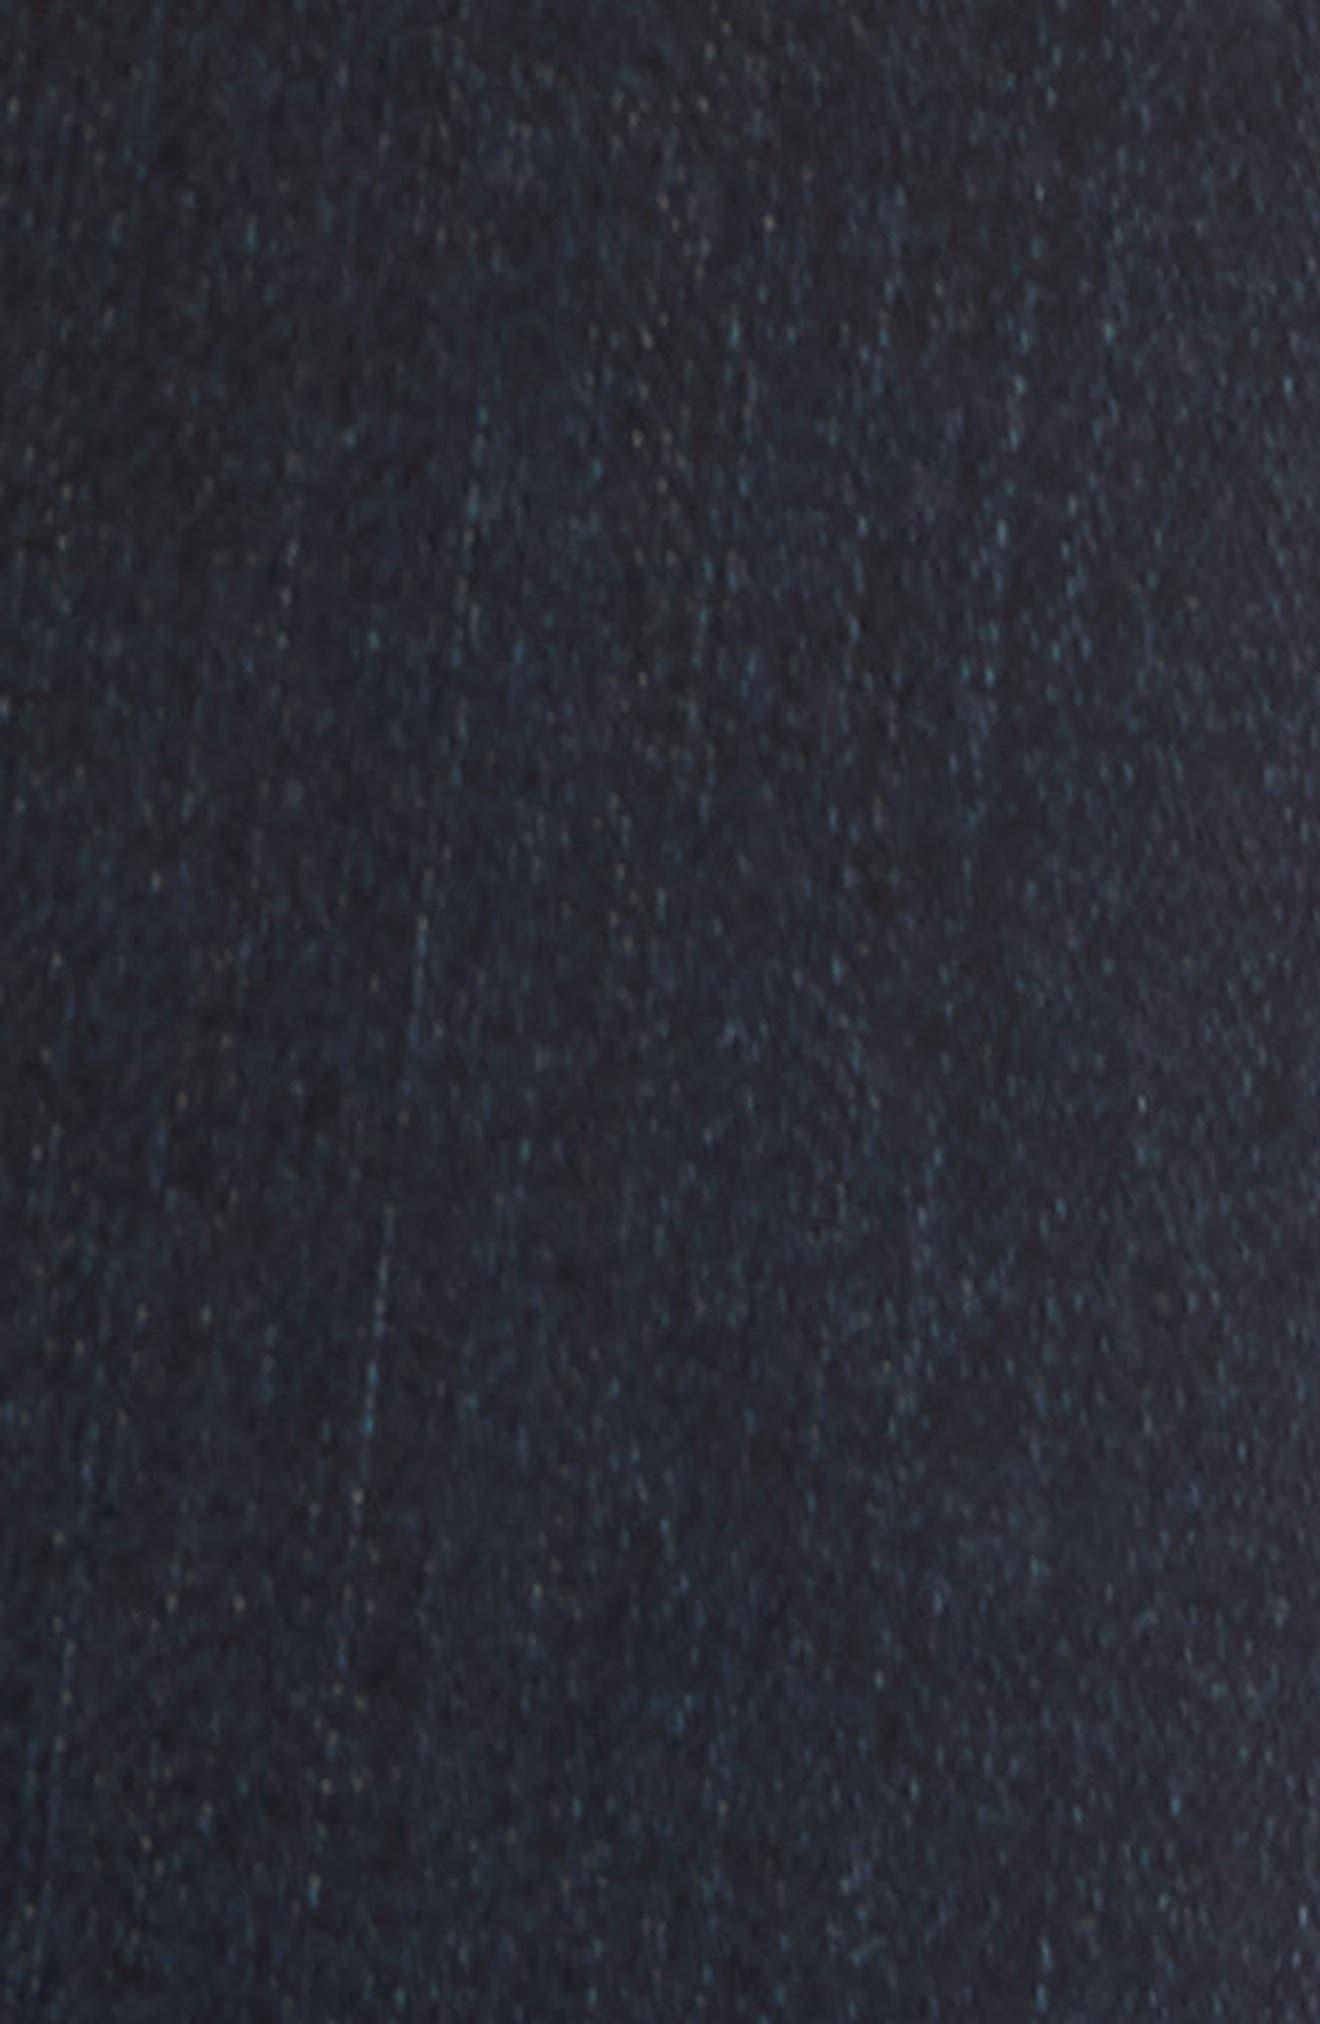 Dylan Skinny Fit Jeans,                             Alternate thumbnail 5, color,                             493